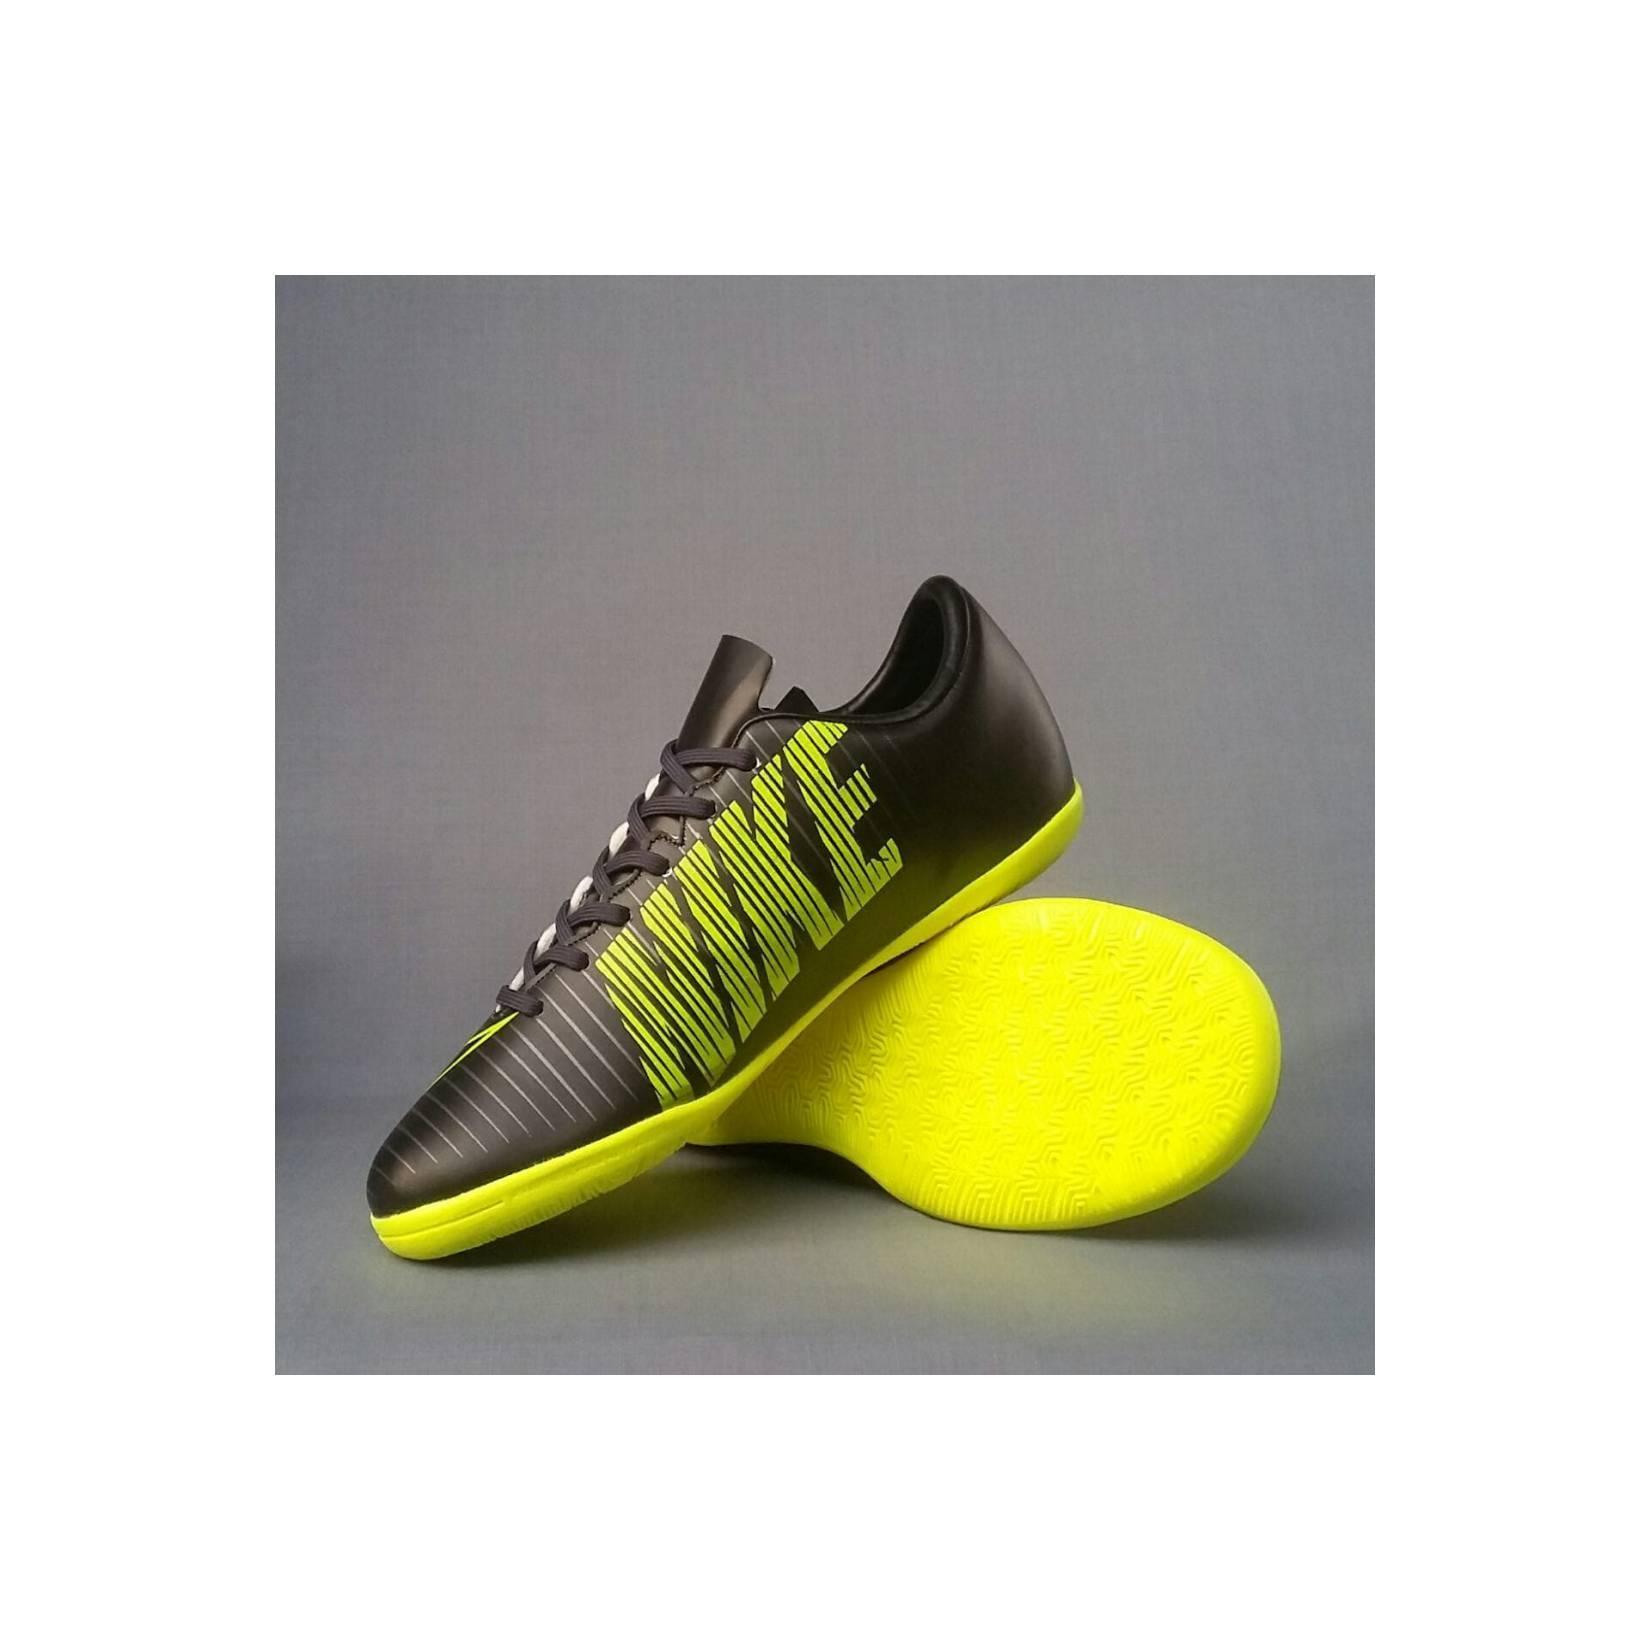 Sepatu Futsal Nike Mercurial X, Sepatu Bola, Sepatu Olahraga Futsal